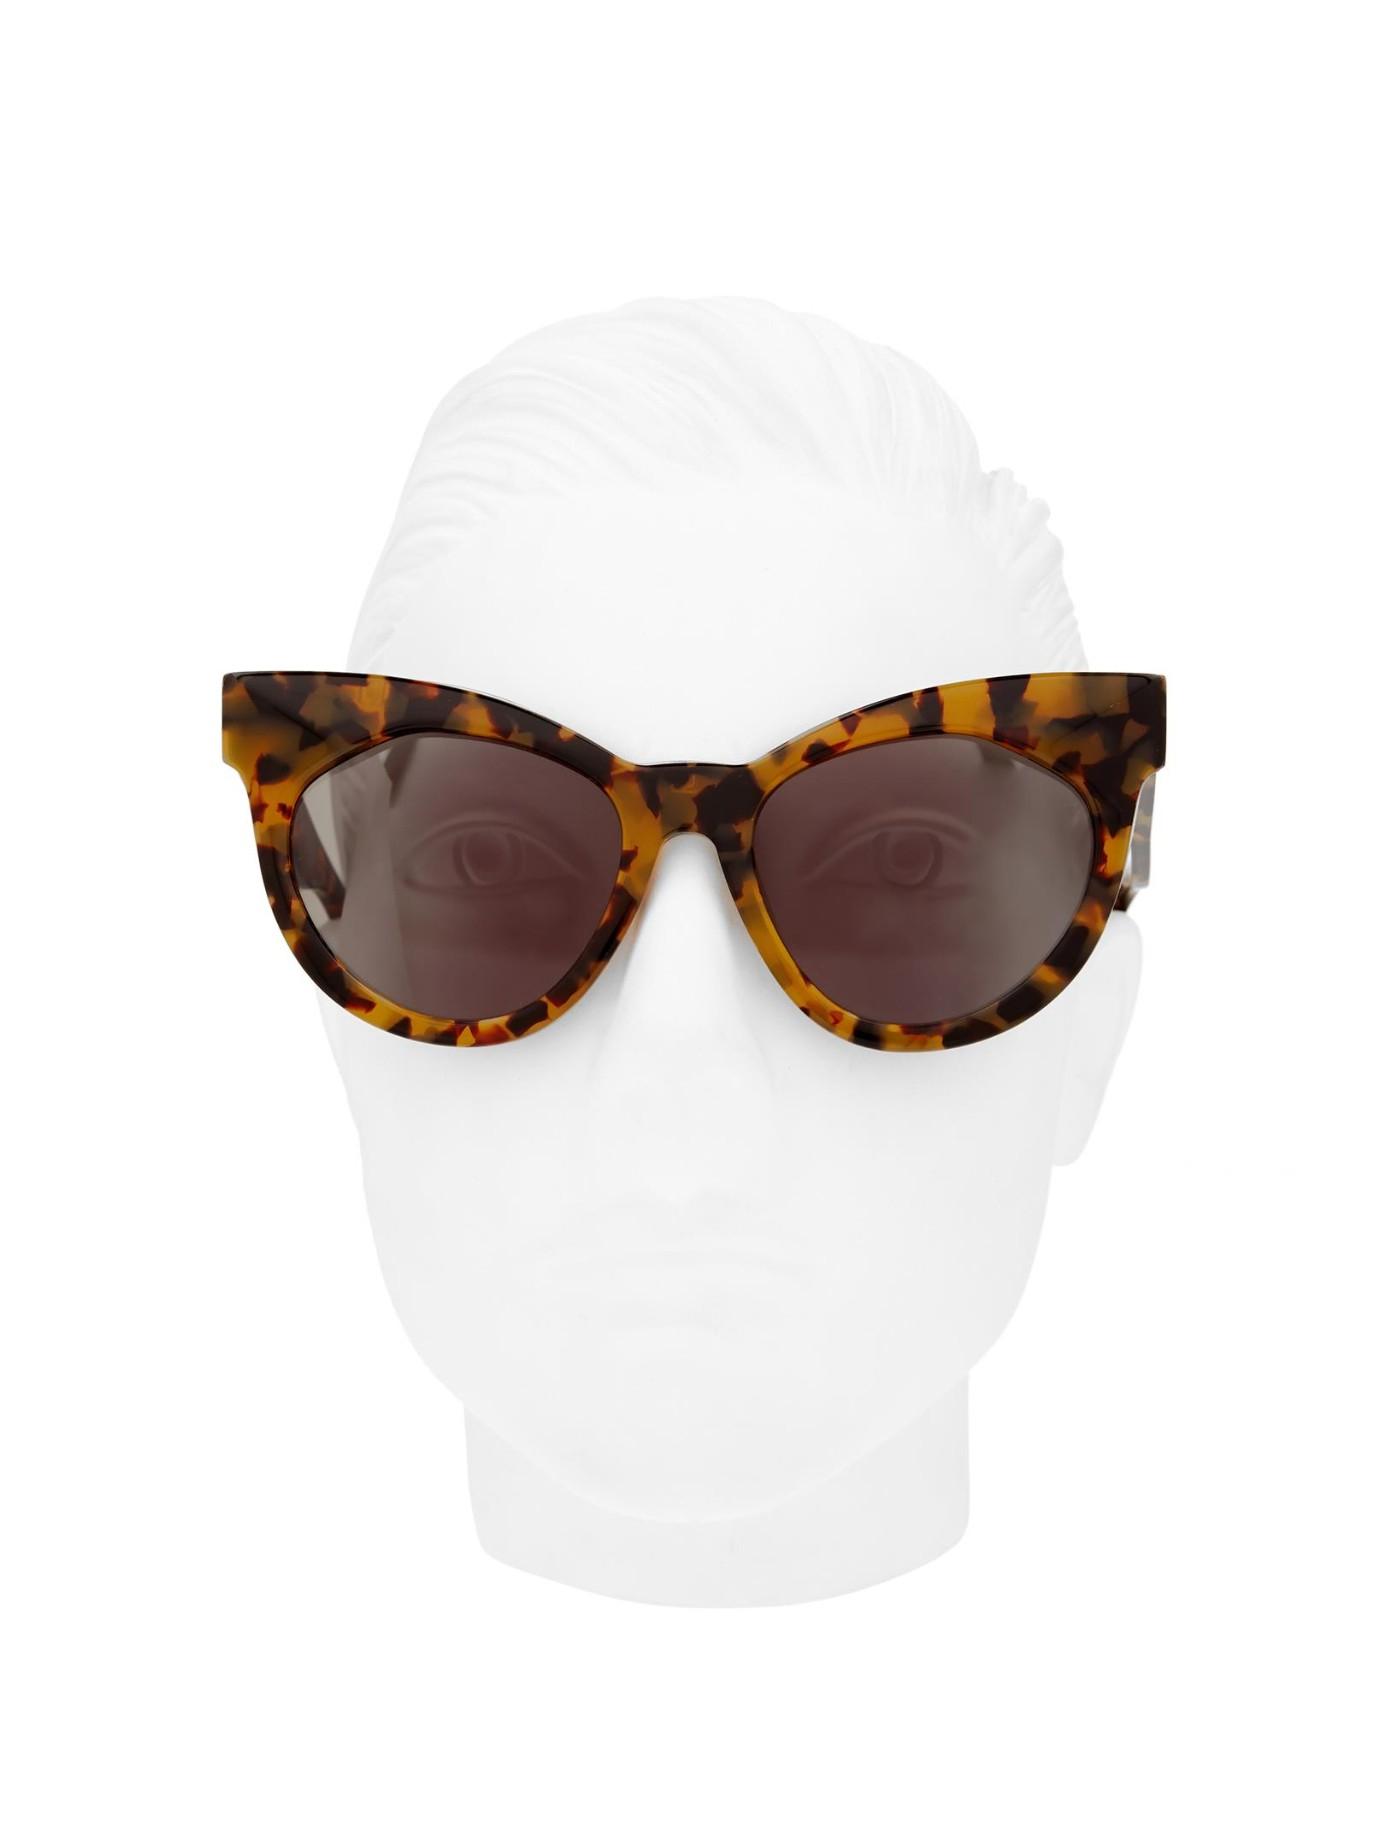 13944eb69c7b ... cat sunglasses